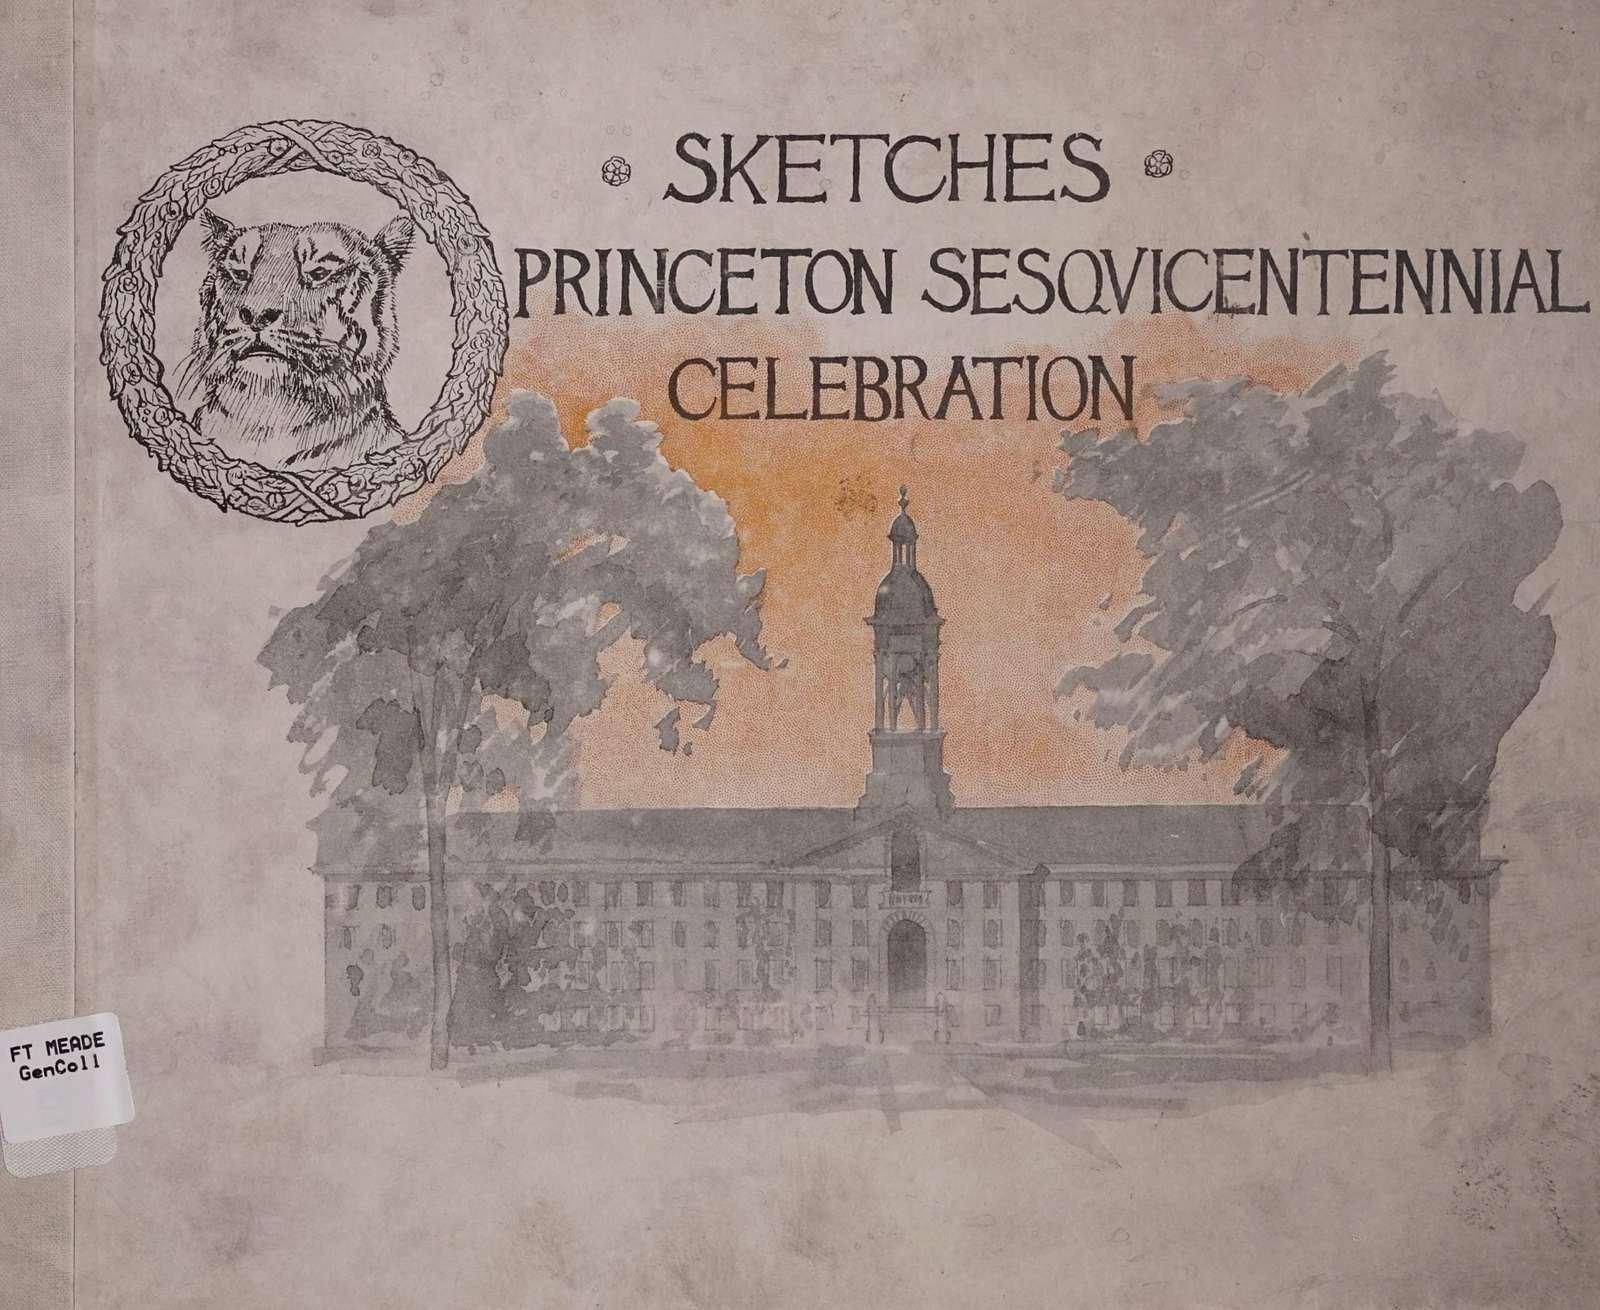 Sketches. Princeton sesqvicentennial celebration